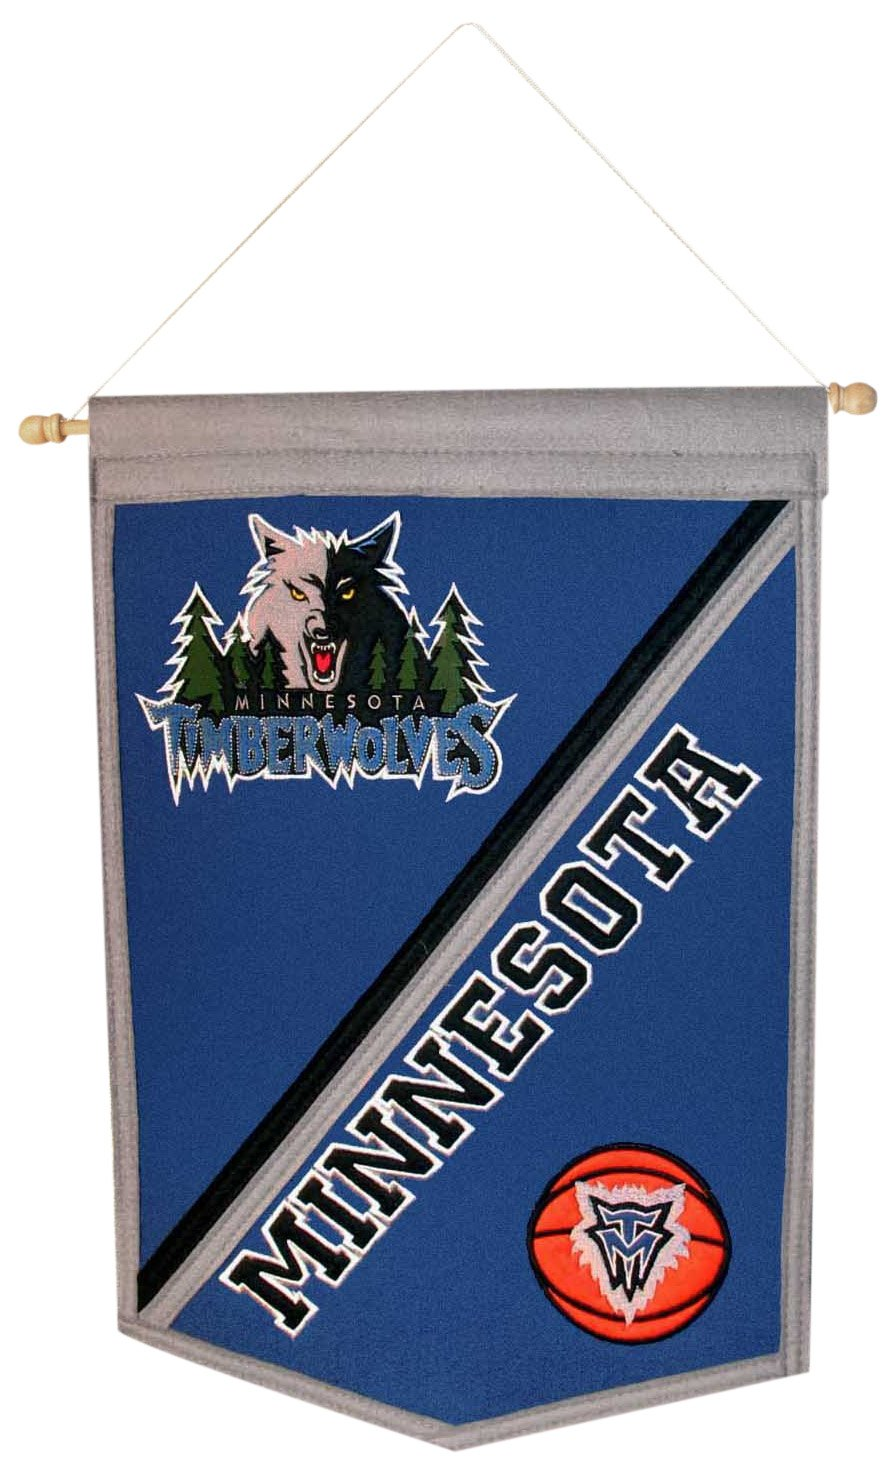 NBA Minnesota Timberwolves伝統バナー   B000H27UL8